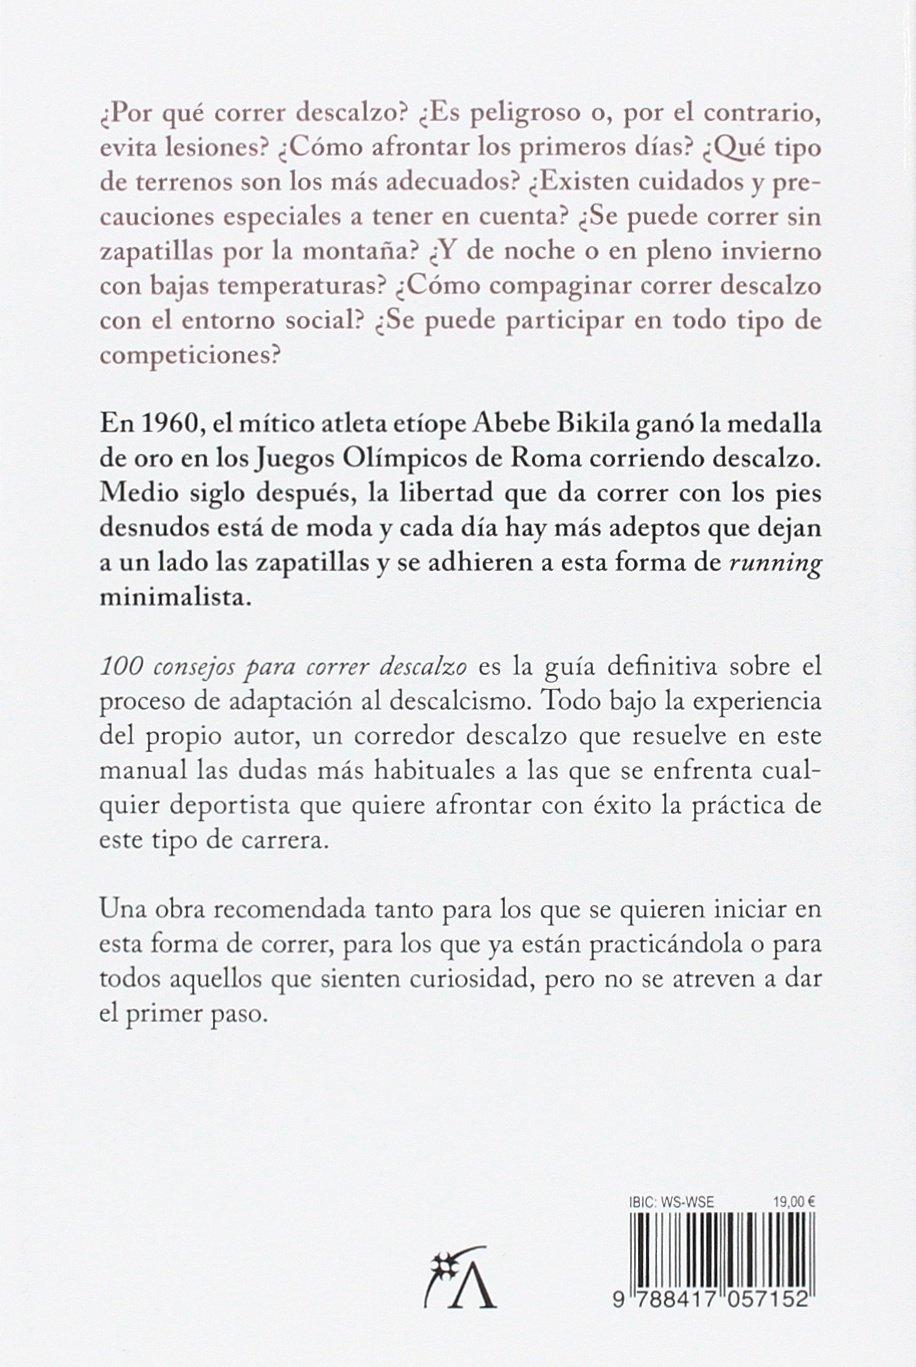 100 CONSEJOS PARA CORRER DESCALZO: Emilio Sáez Soro: 9788417057152: Amazon.com: Books